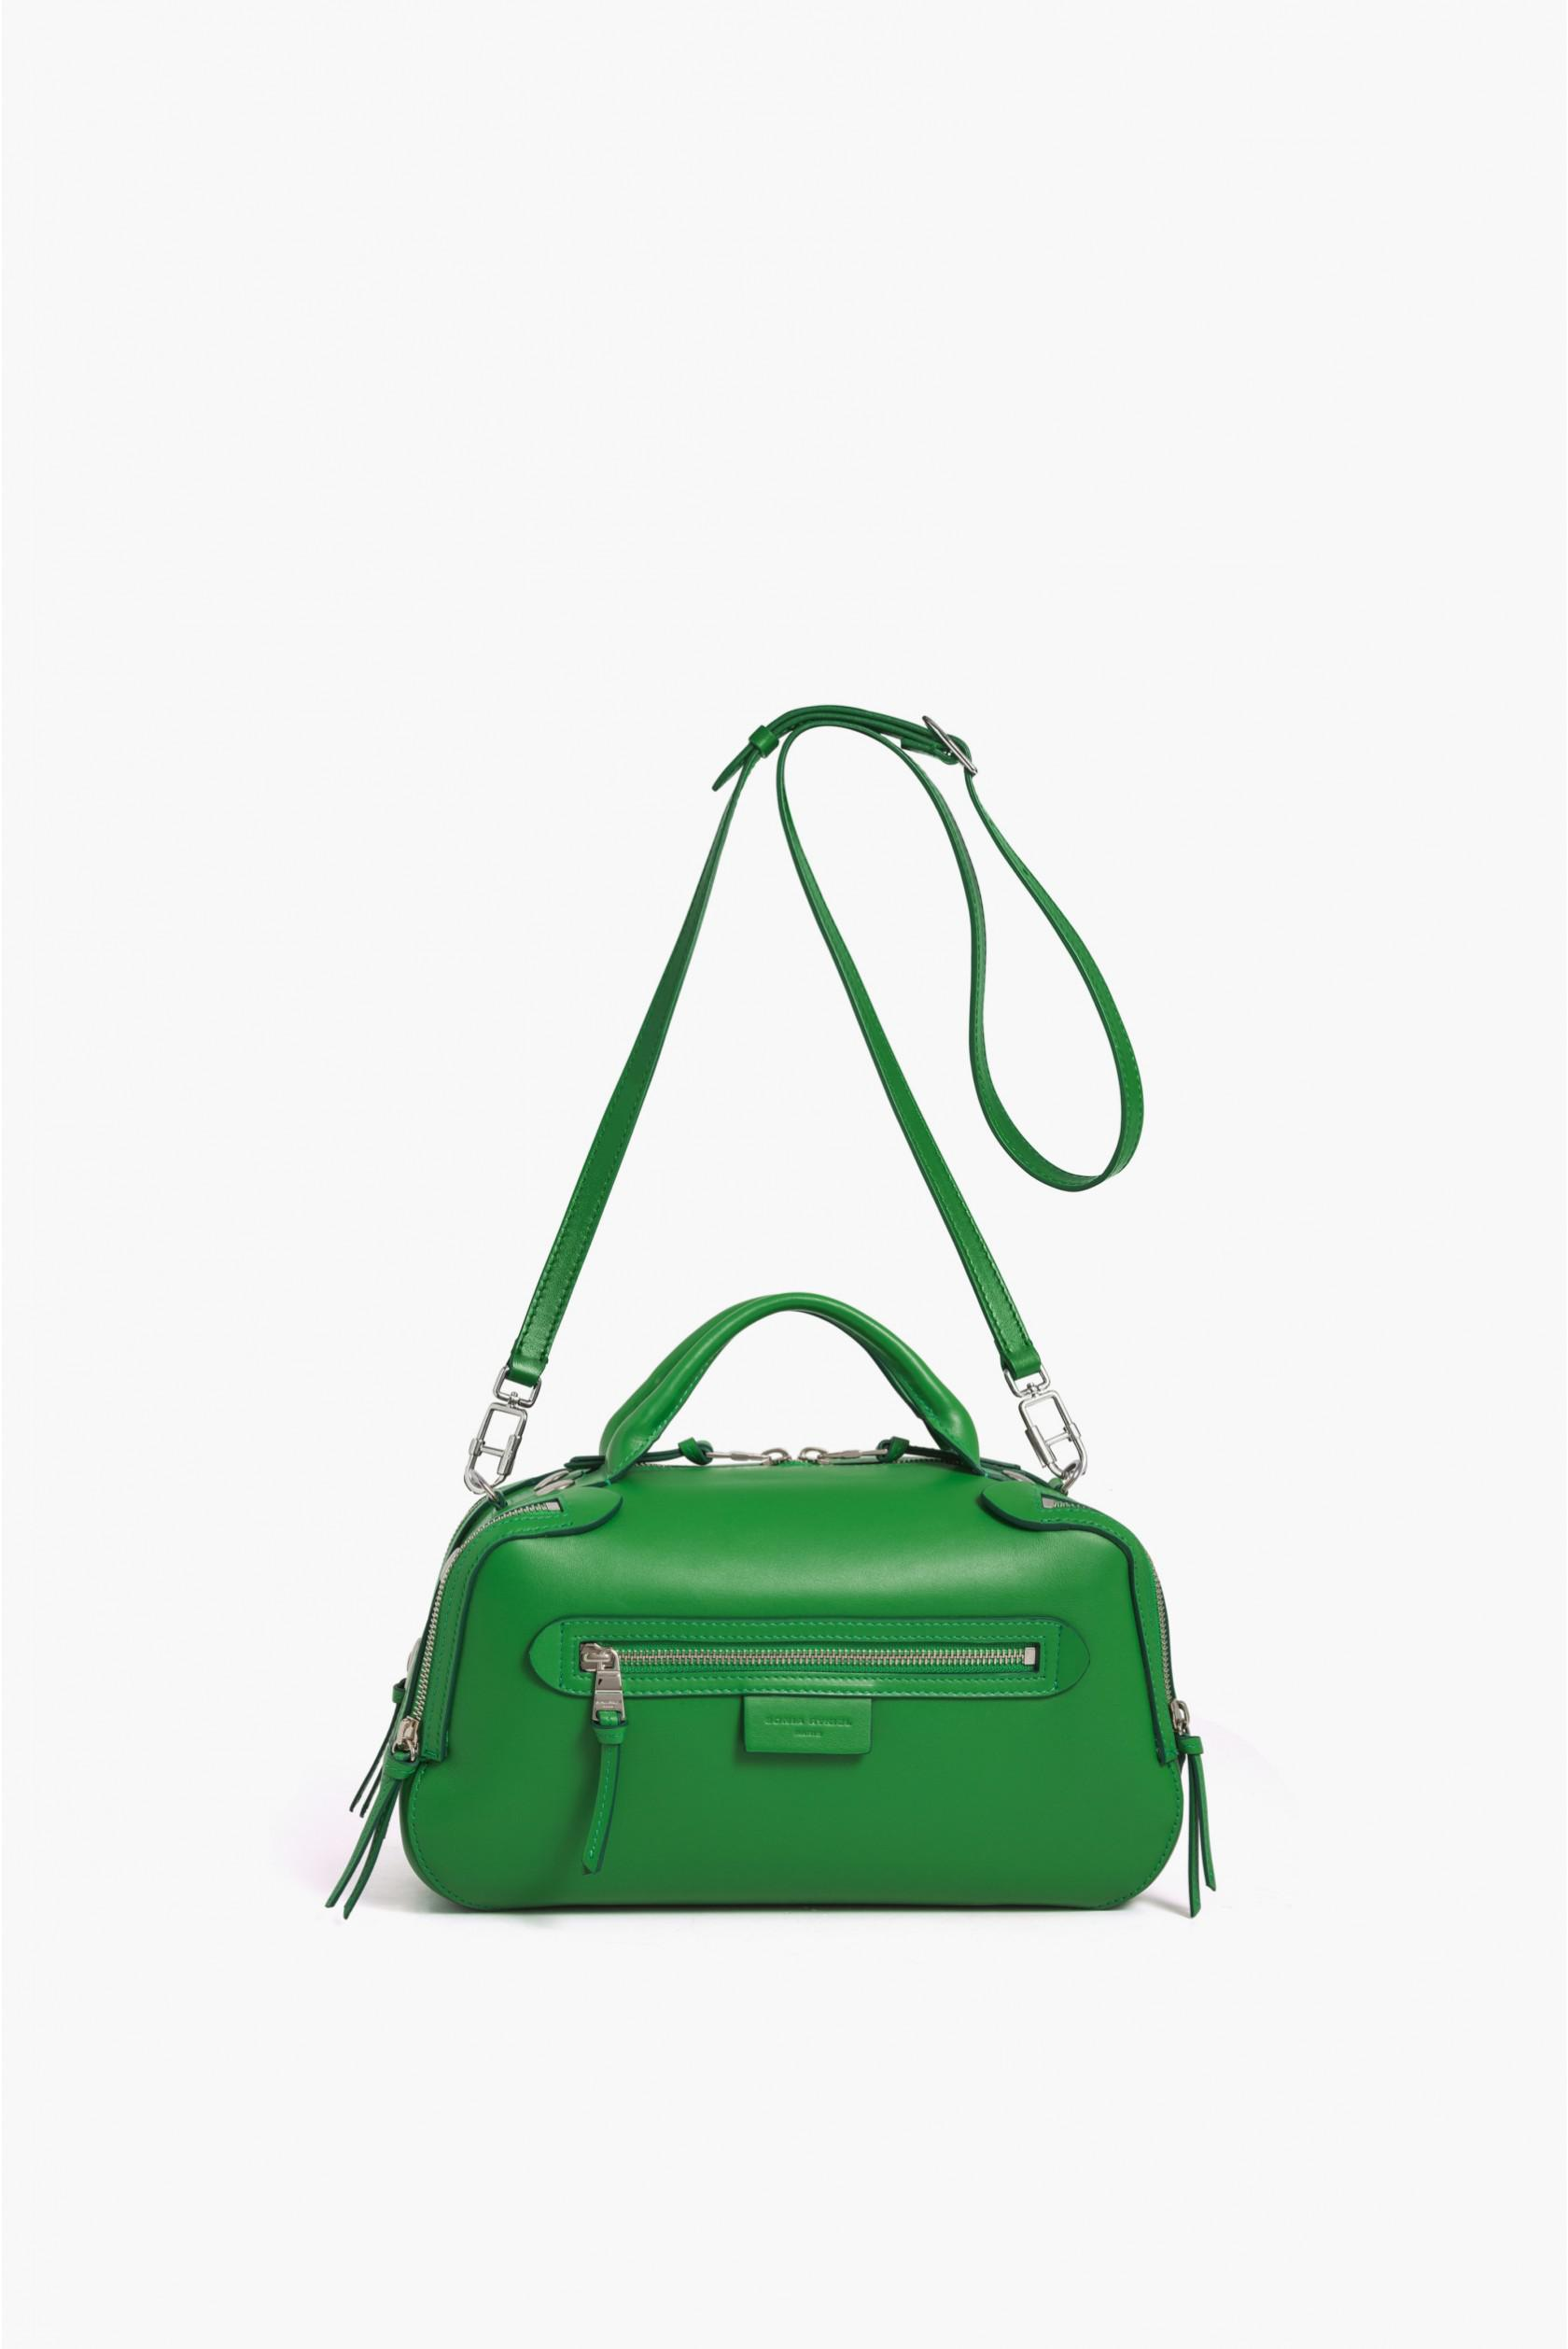 3444f23fa907 Lyst - Sonia Rykiel Small Boulevard Bag in Green